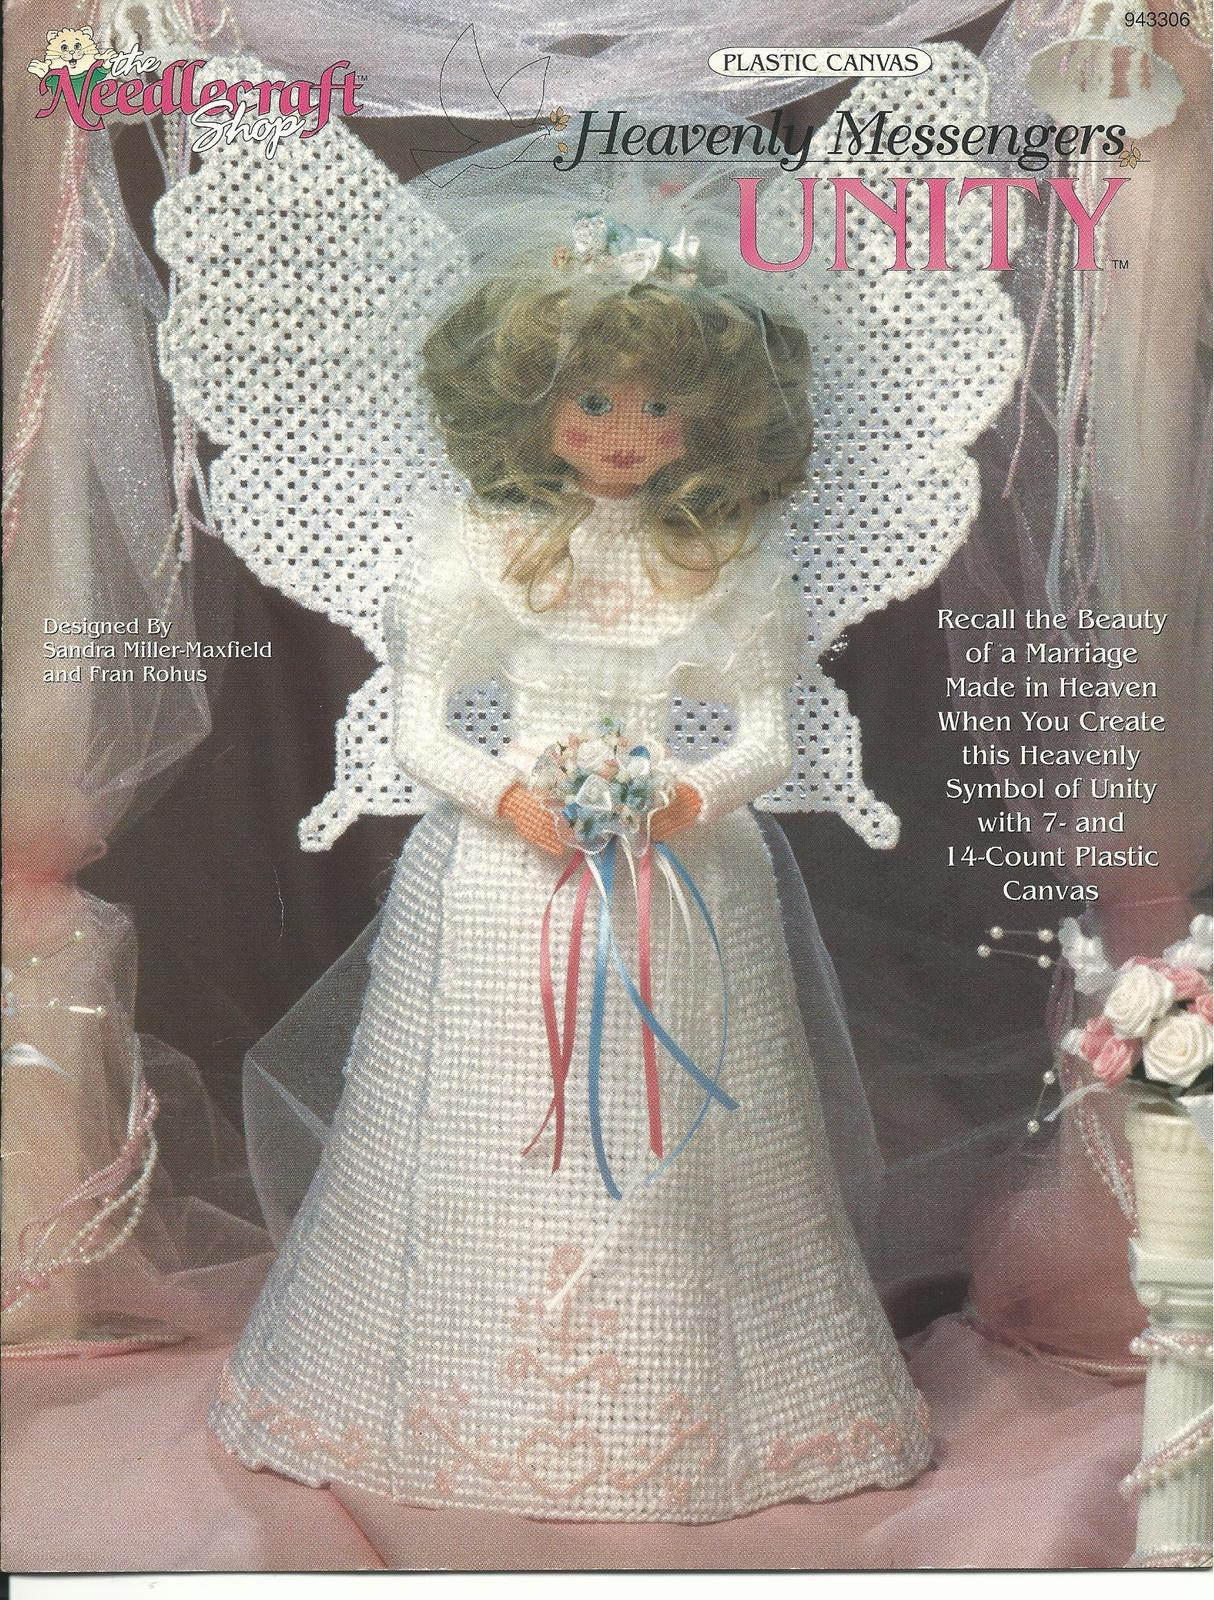 Annie/'s plastic canvas pattern leaflet School Blackboard ~ fits Barbie dolls